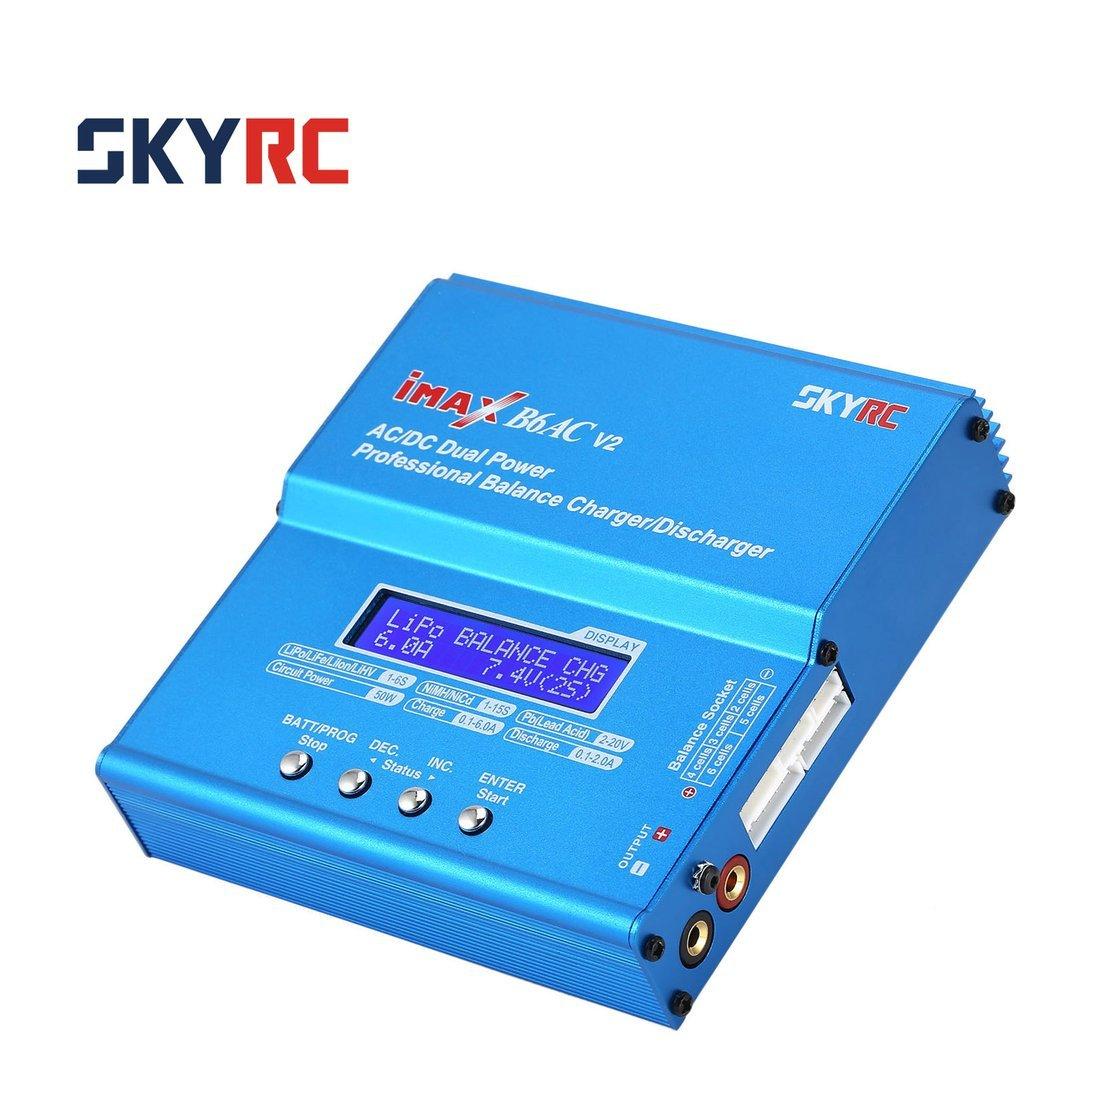 Hermosairis SKYRC iMAX B6AC V2 6A 50 50 50 Watt AC / DC Lipo NiMH Pb Balance Ladegerät / Entlader mit Adapter LCD Display für RC Auto Drone Hubschrauber 93b339